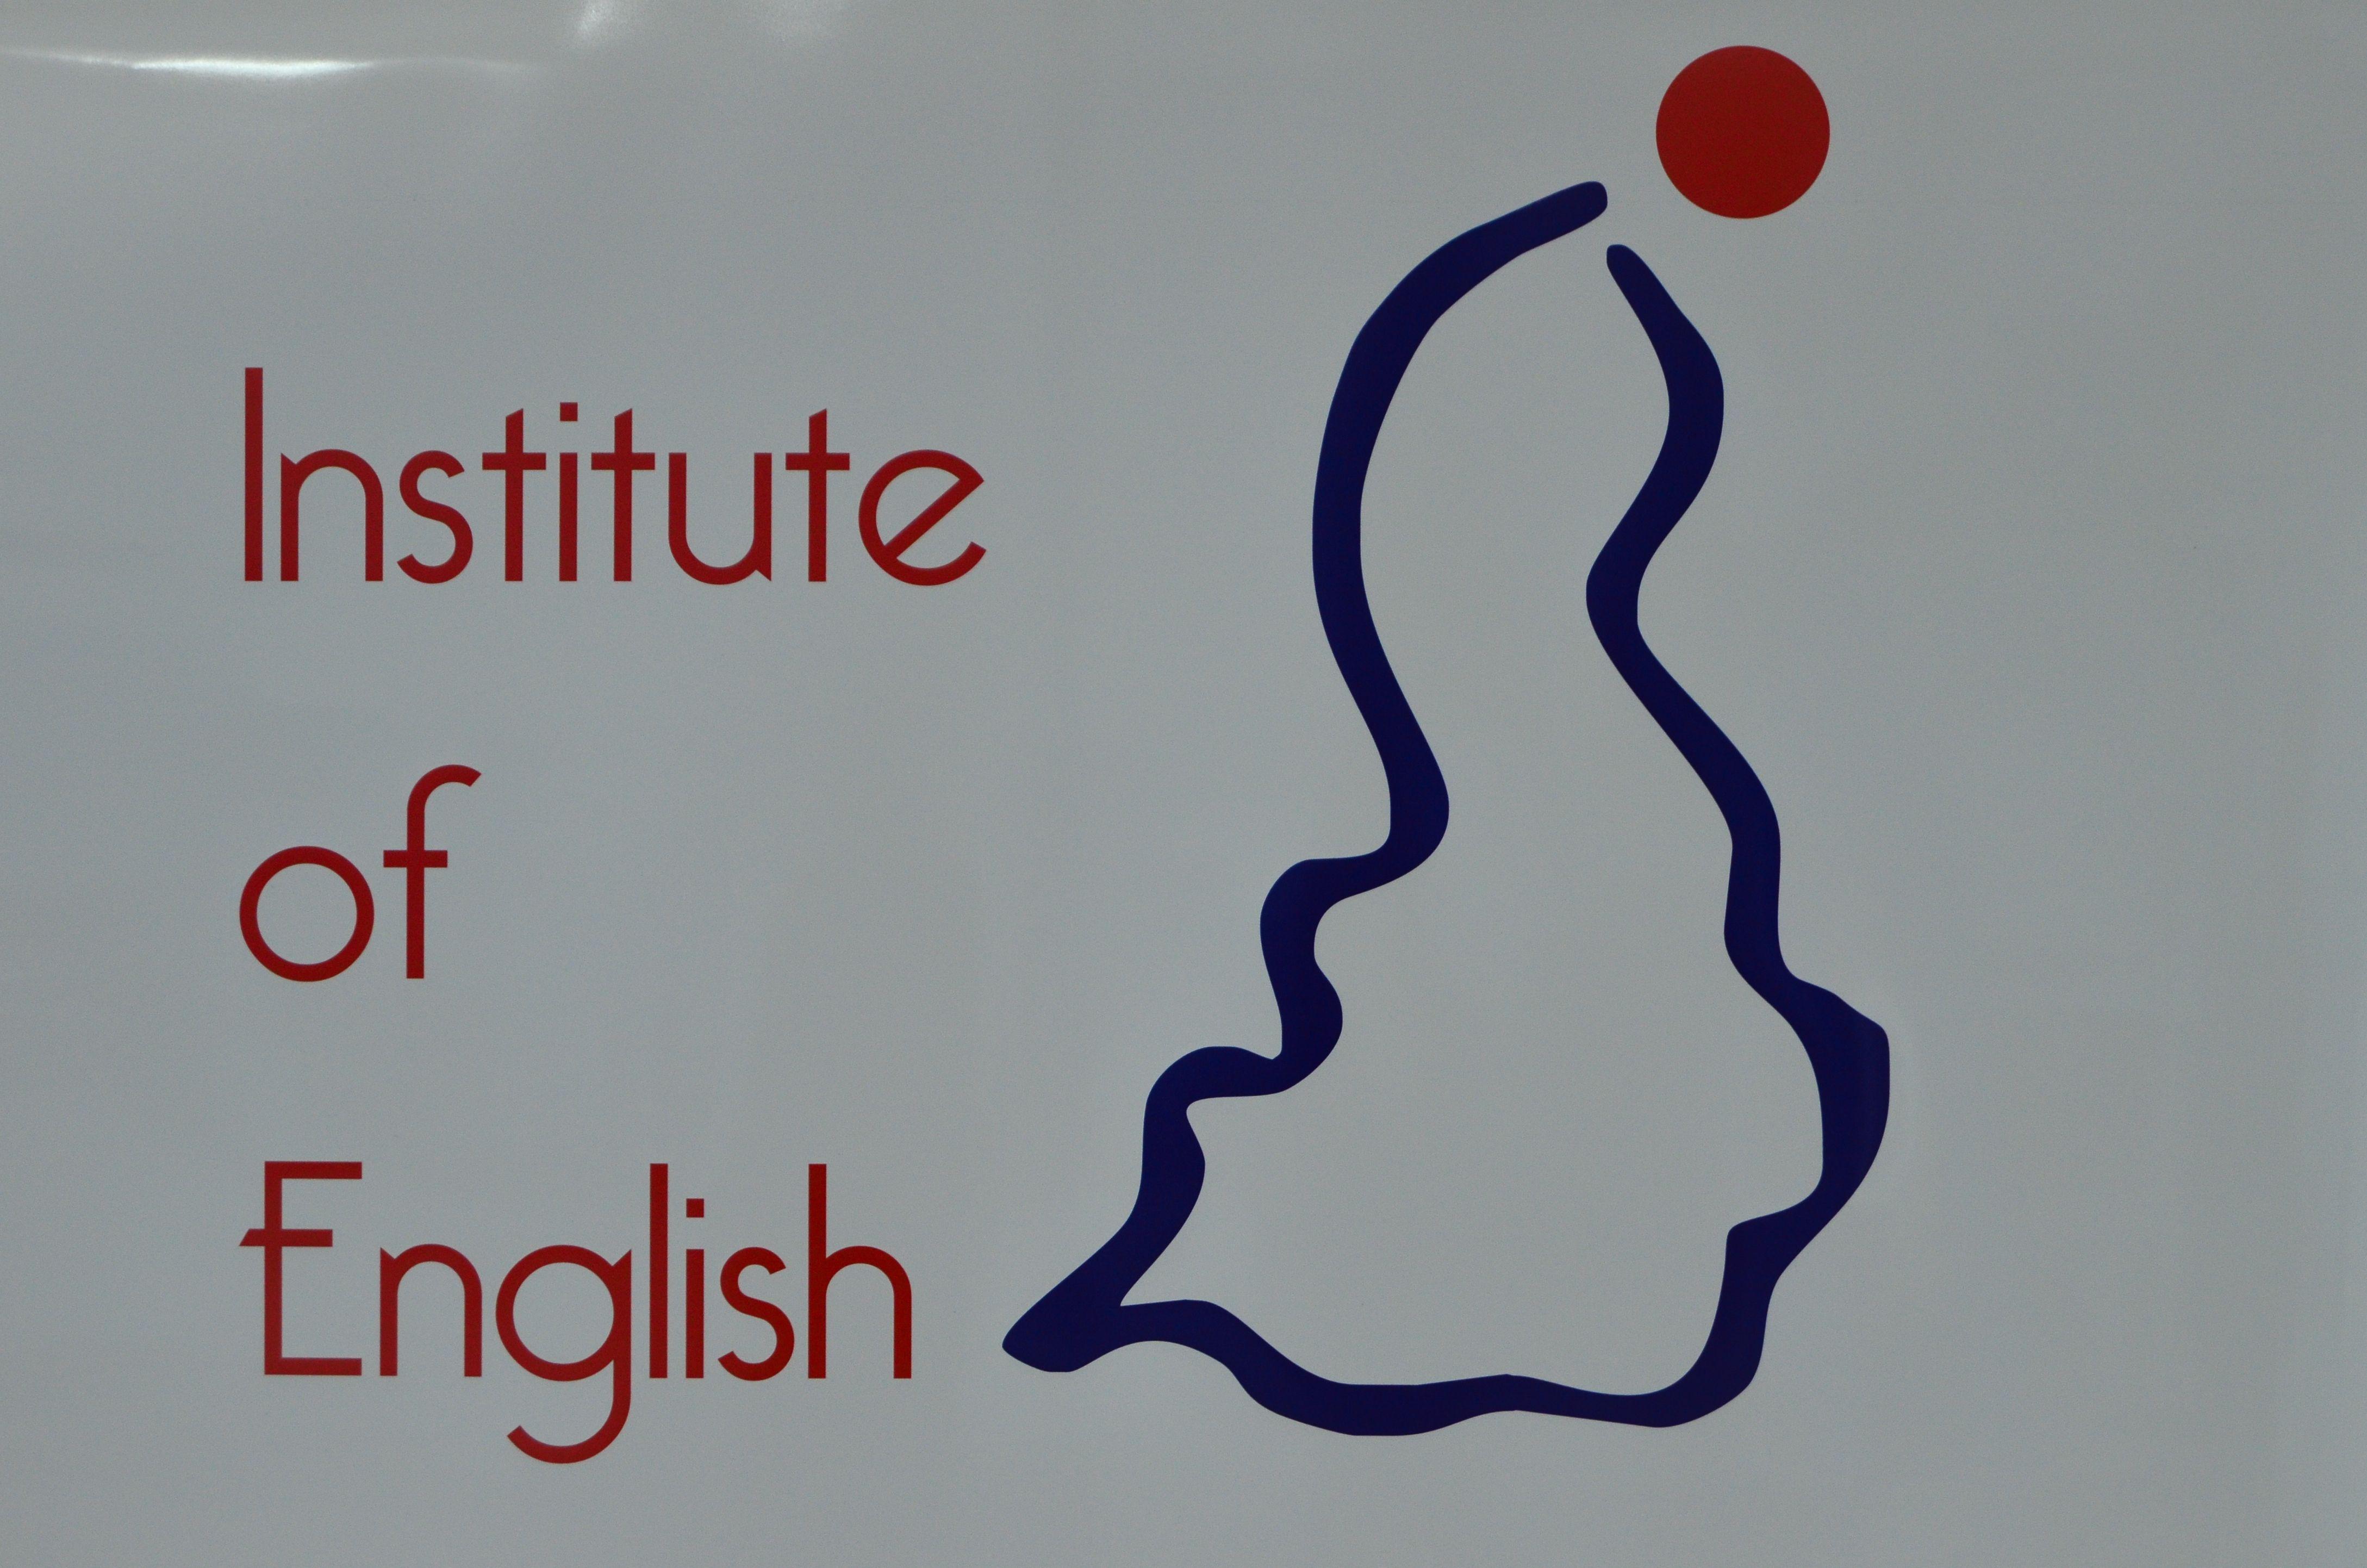 Foto 11 de Academias de idiomas en Burjassot | Institute of English